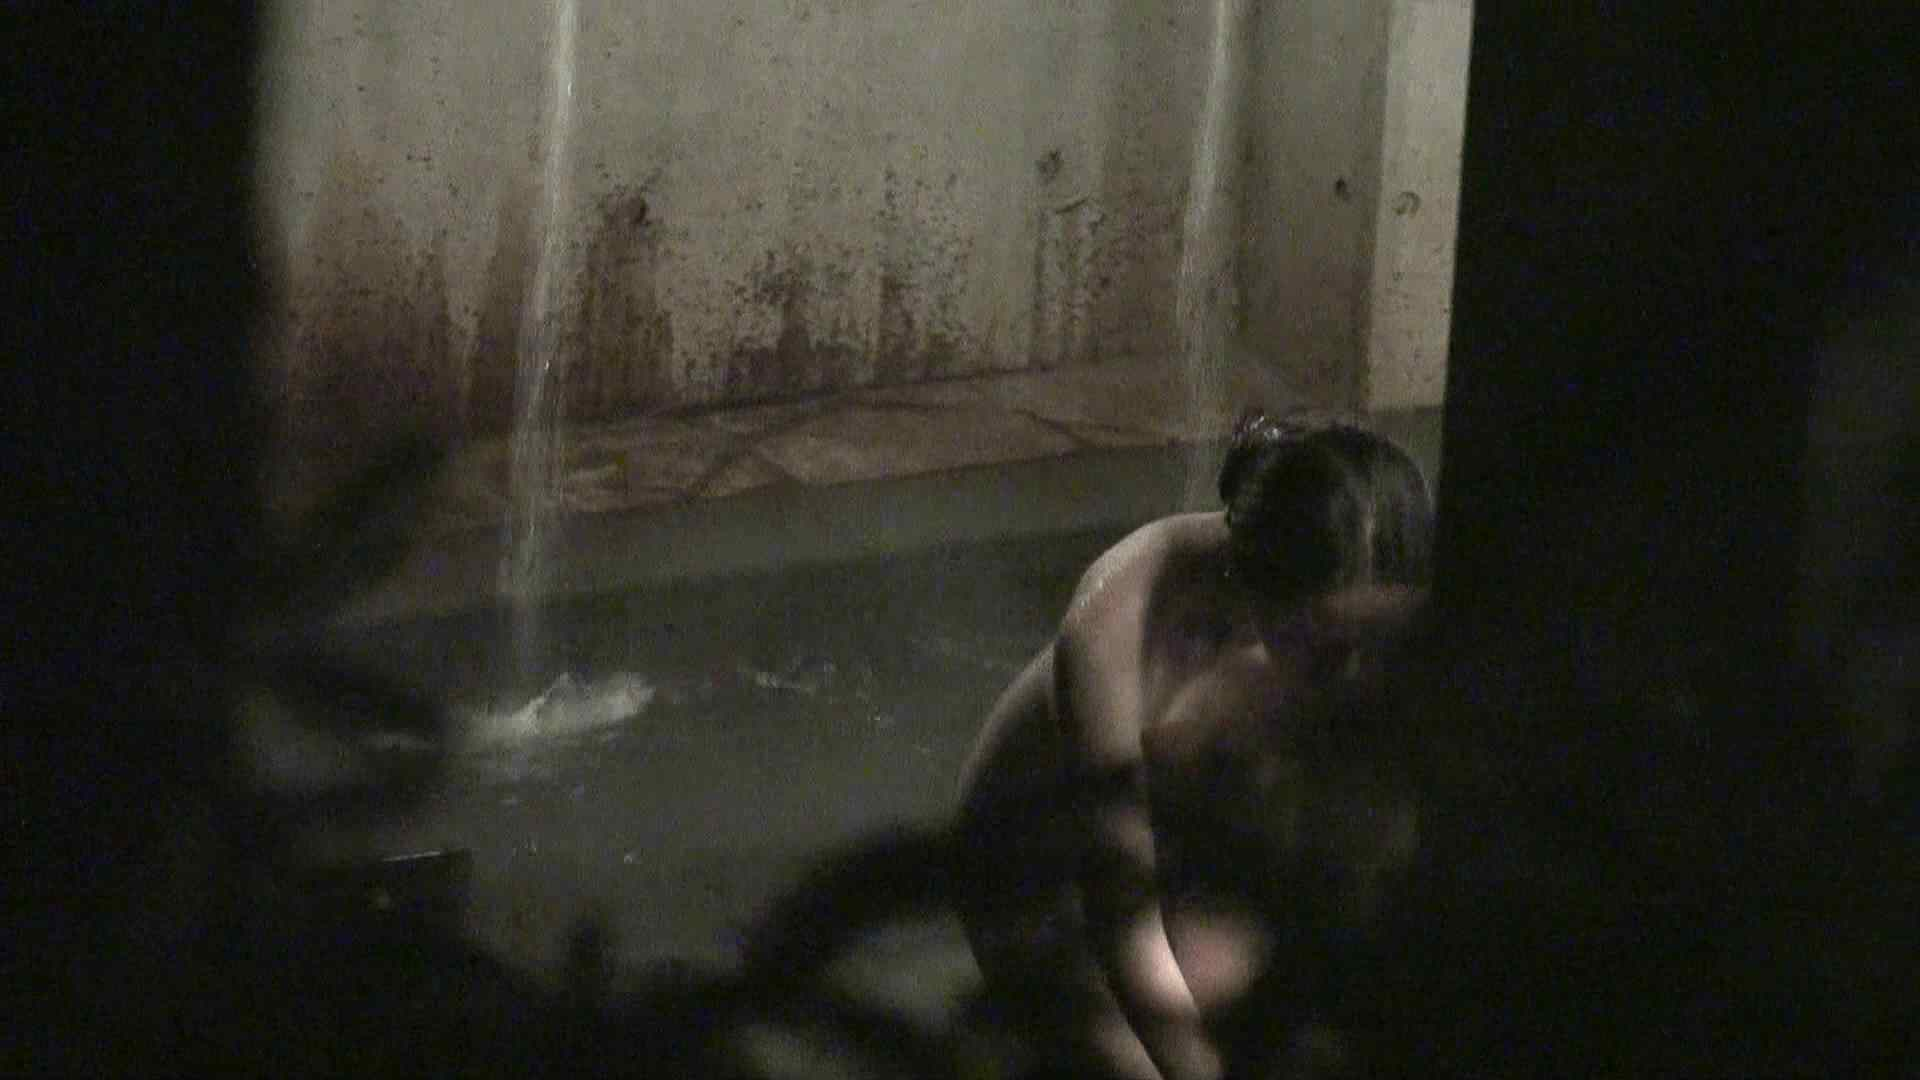 Aquaな露天風呂Vol.319 OLのプライベート アダルト動画キャプチャ 10pic 2